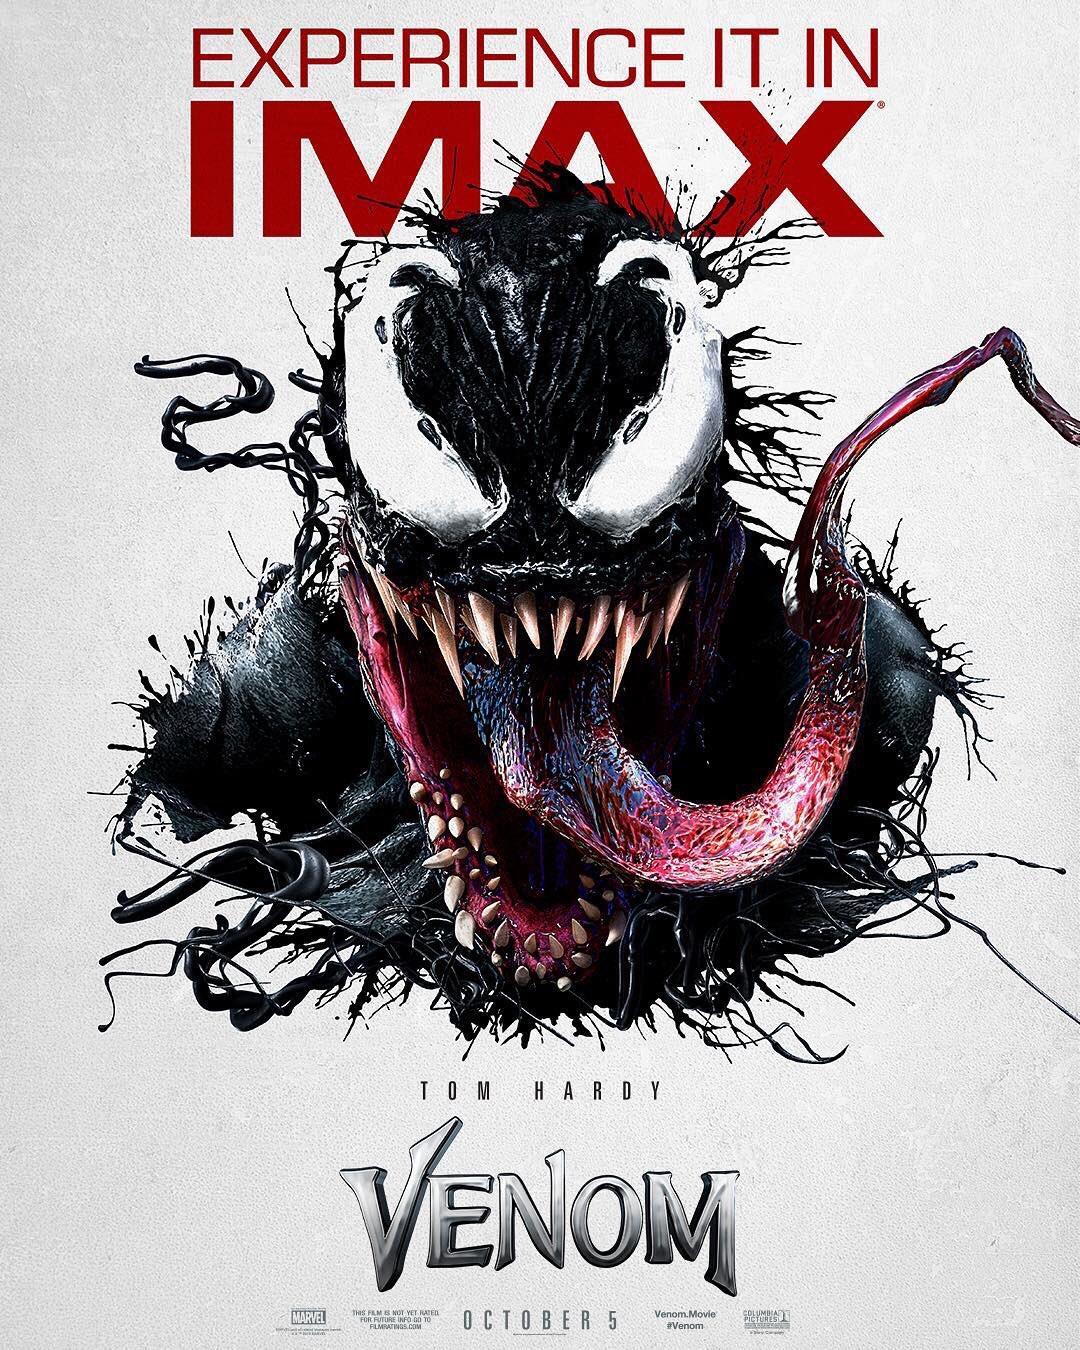 Venom' gets a vicious IMAX poster - Superhero News